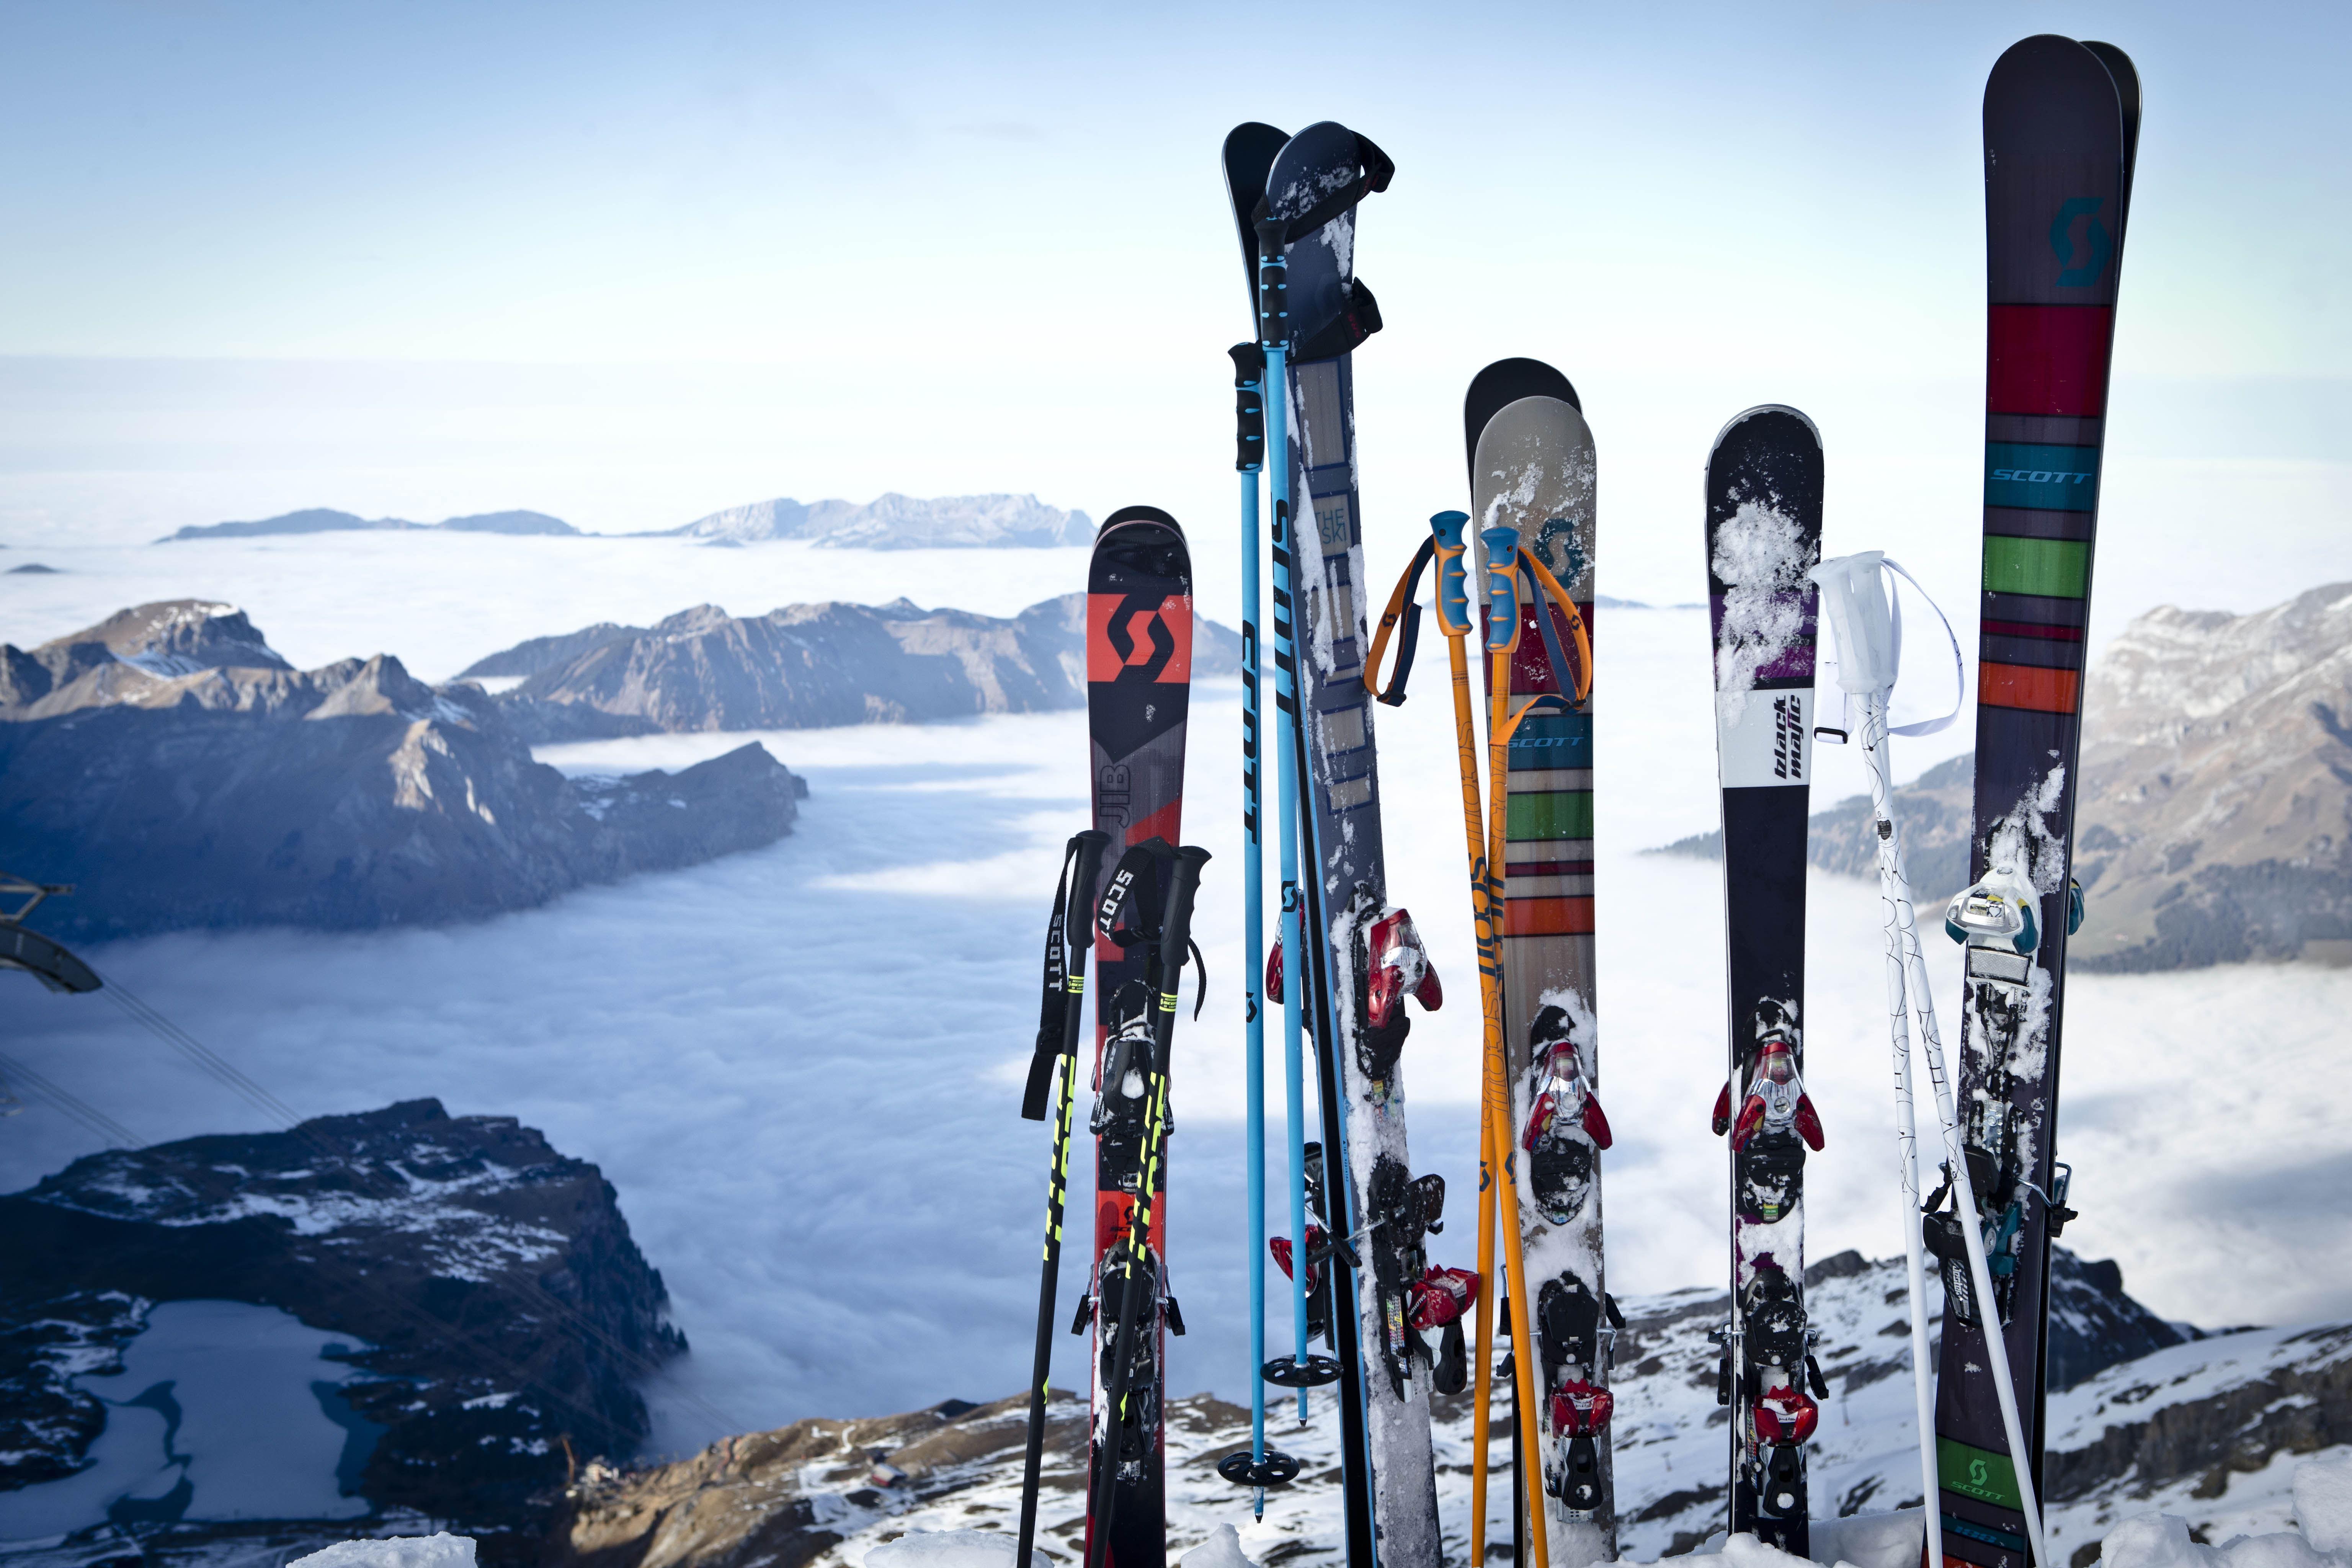 Ski rental, Storlien Sportcenter